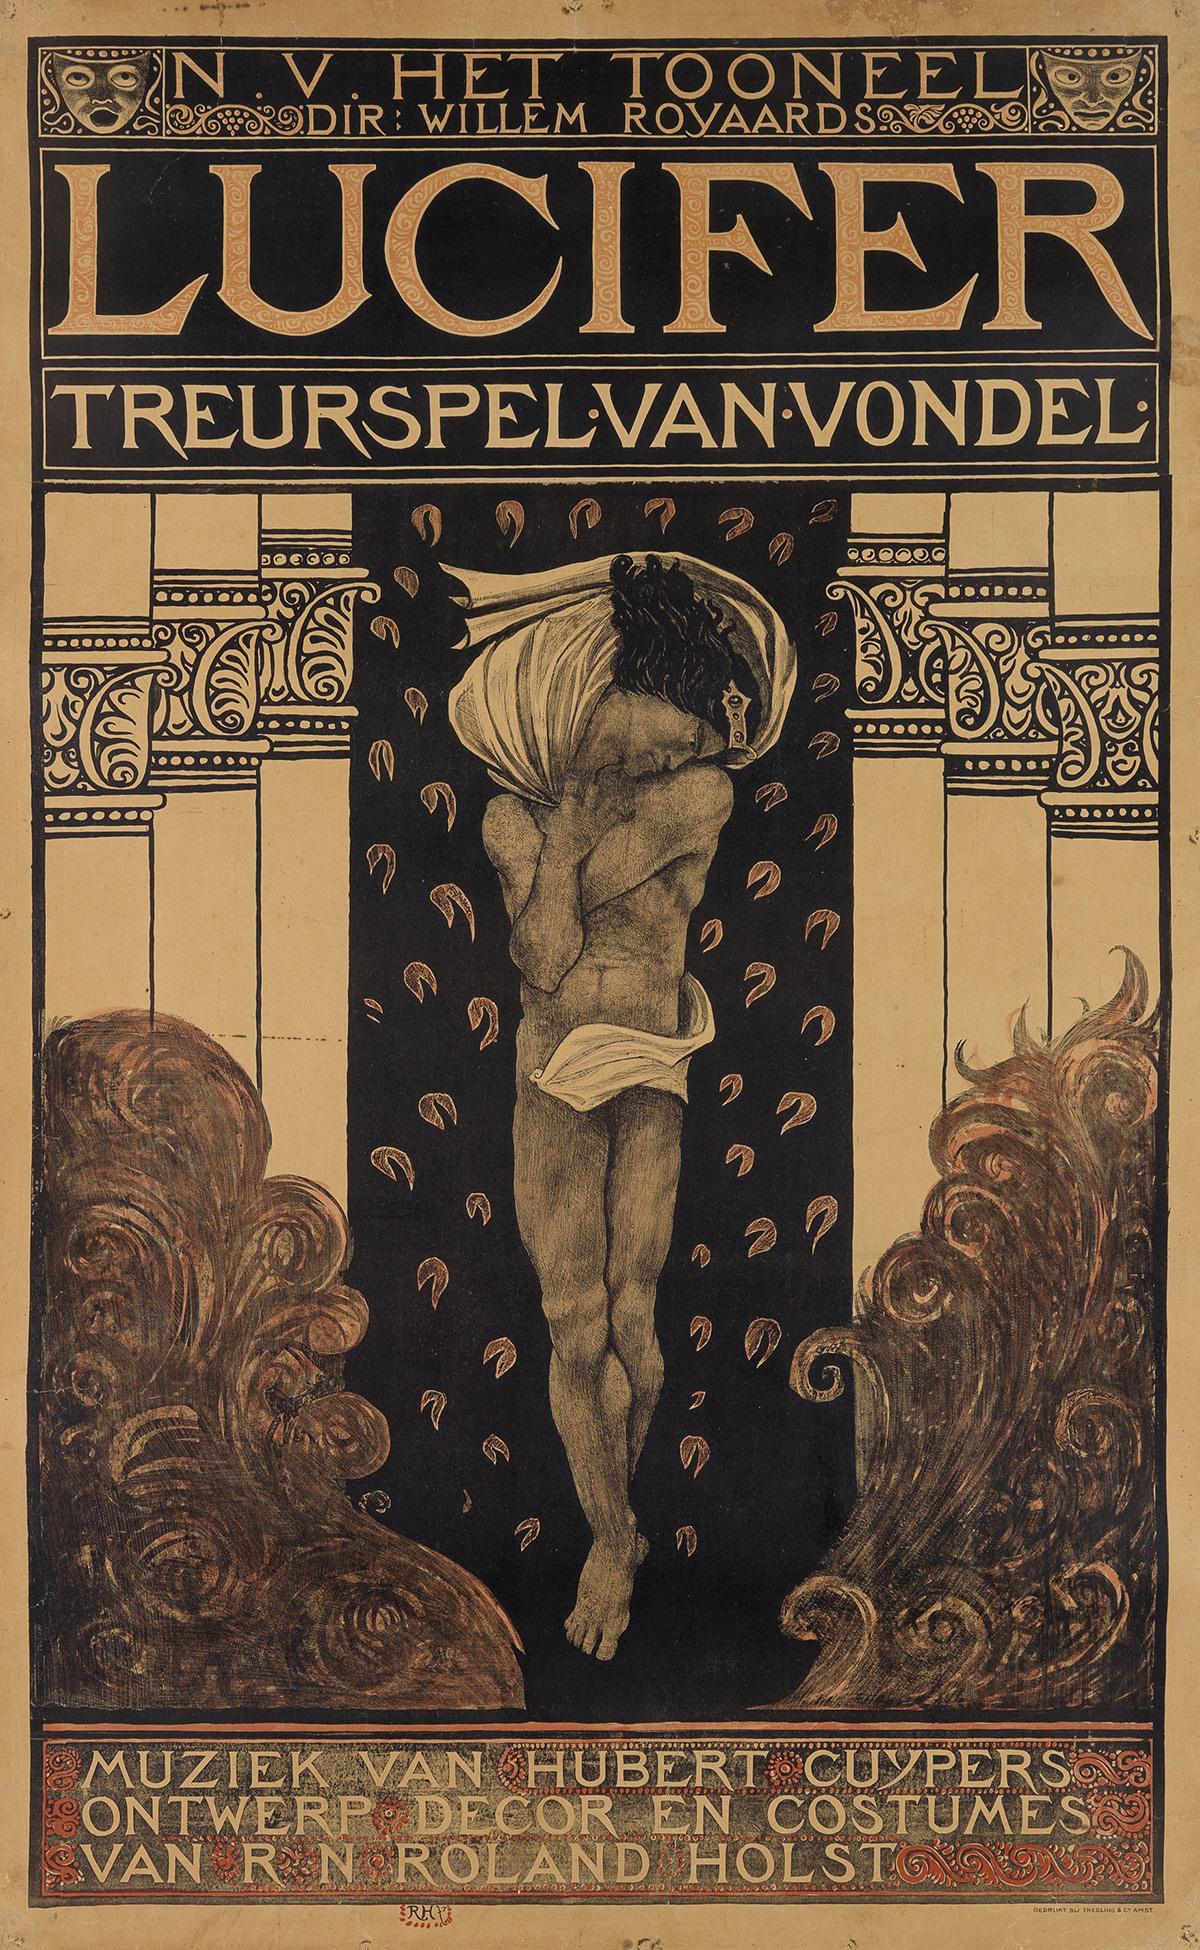 RICHARD-N-ROLAND-HOLST-(1868-1938)-LUCIFER--TREURSPEL-VAN-VO